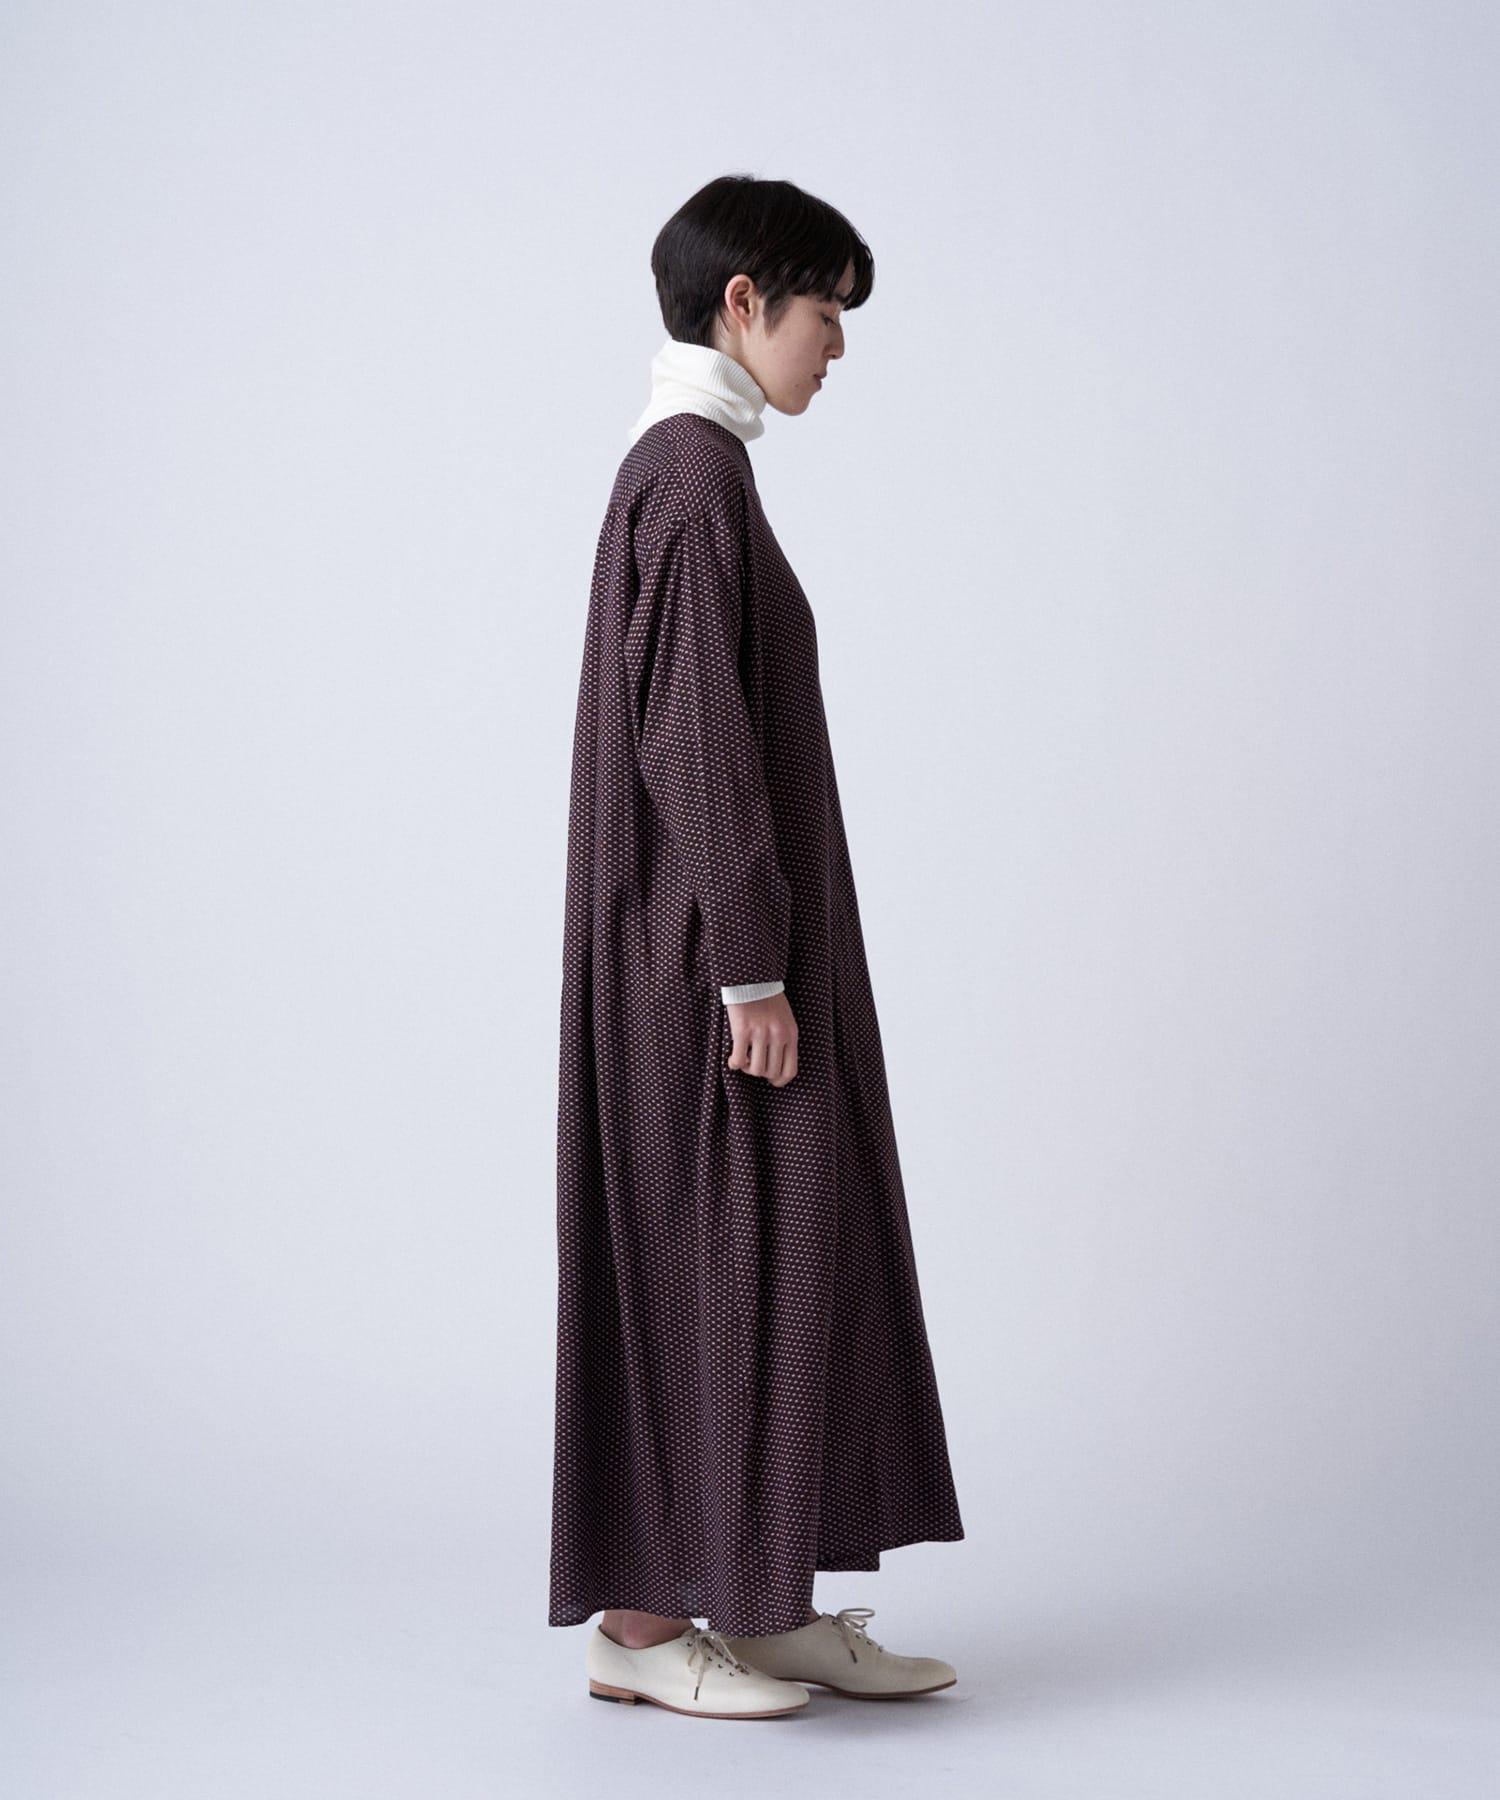 BLOOM&BRANCH(ブルームアンドブランチ) Phlannèl / Komon  Kaftan  Dress